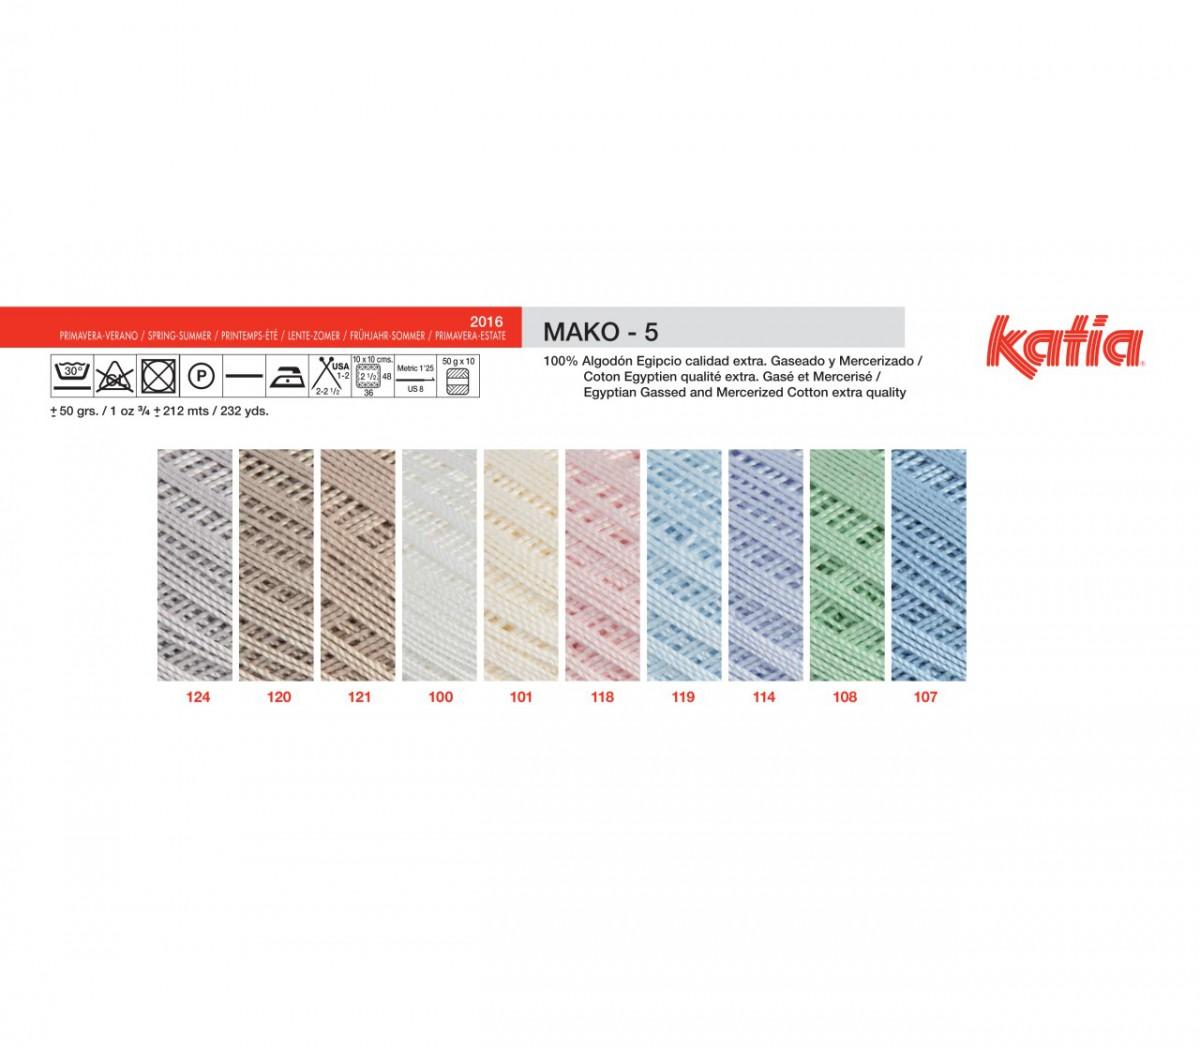 106 - 50 g // ca 212 m Wolle MAKO 5 von Katia ROSA MEDIO